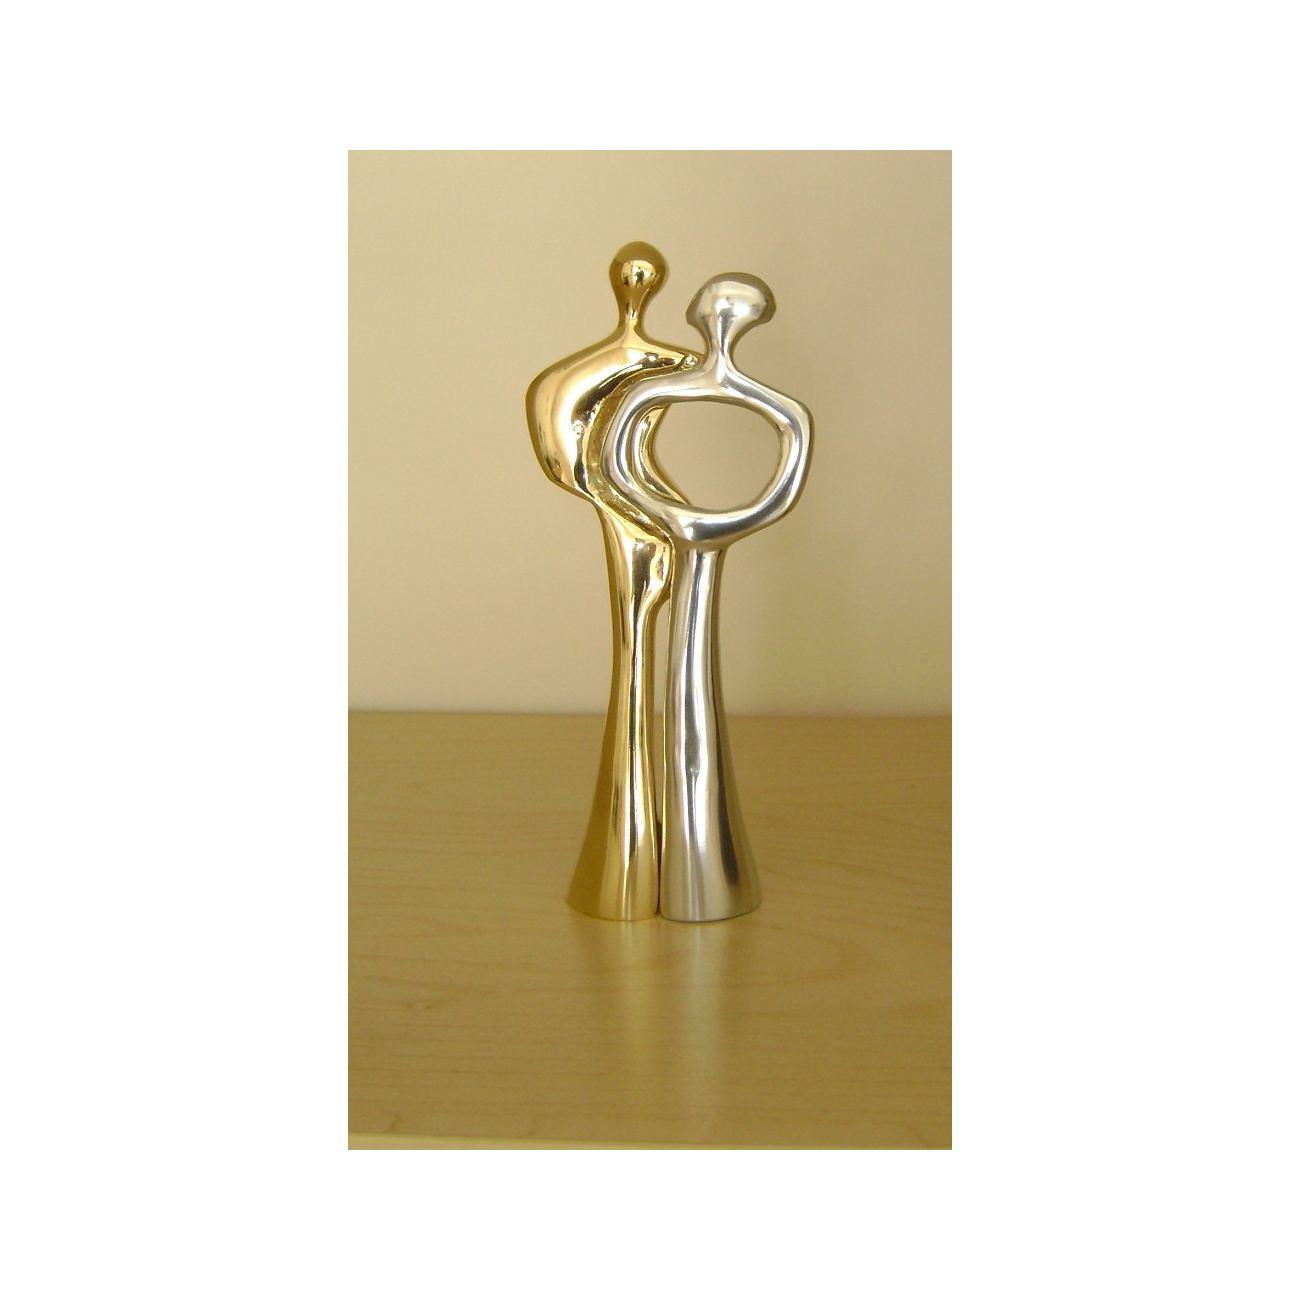 Couple Figurines Art Sculpture - Handmade Metal Decor, 2 Pcs - Gold ...